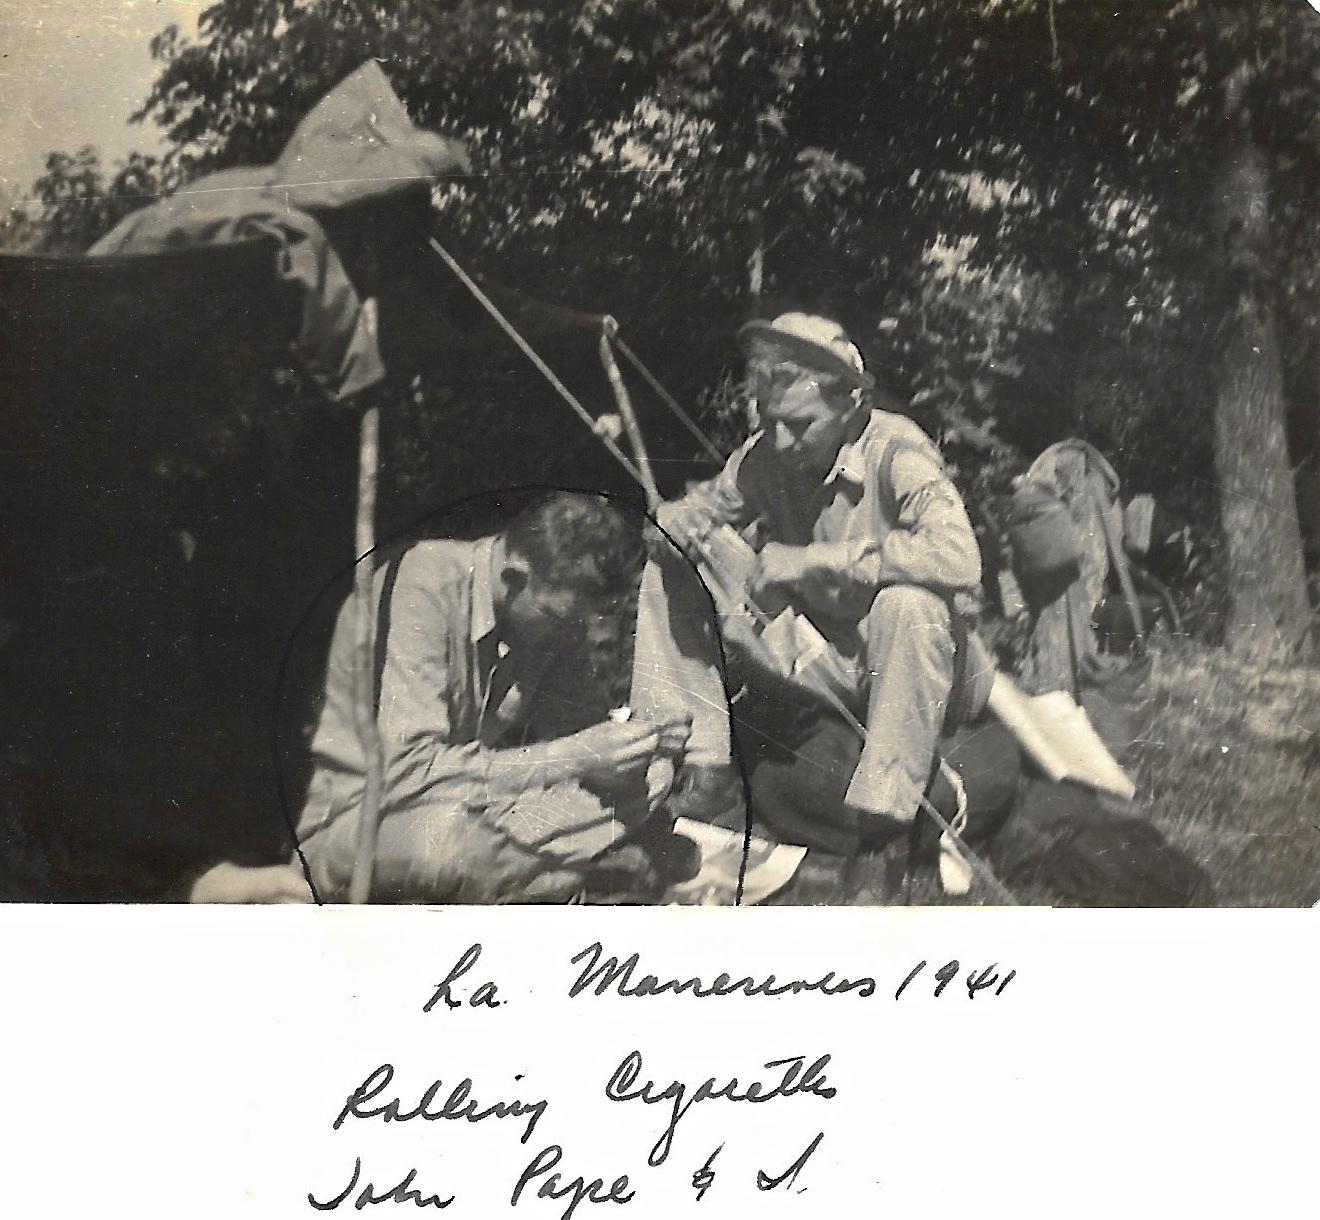 1941 WWII Ernie Faulkner, John Pope, Louisiana Maneuvers